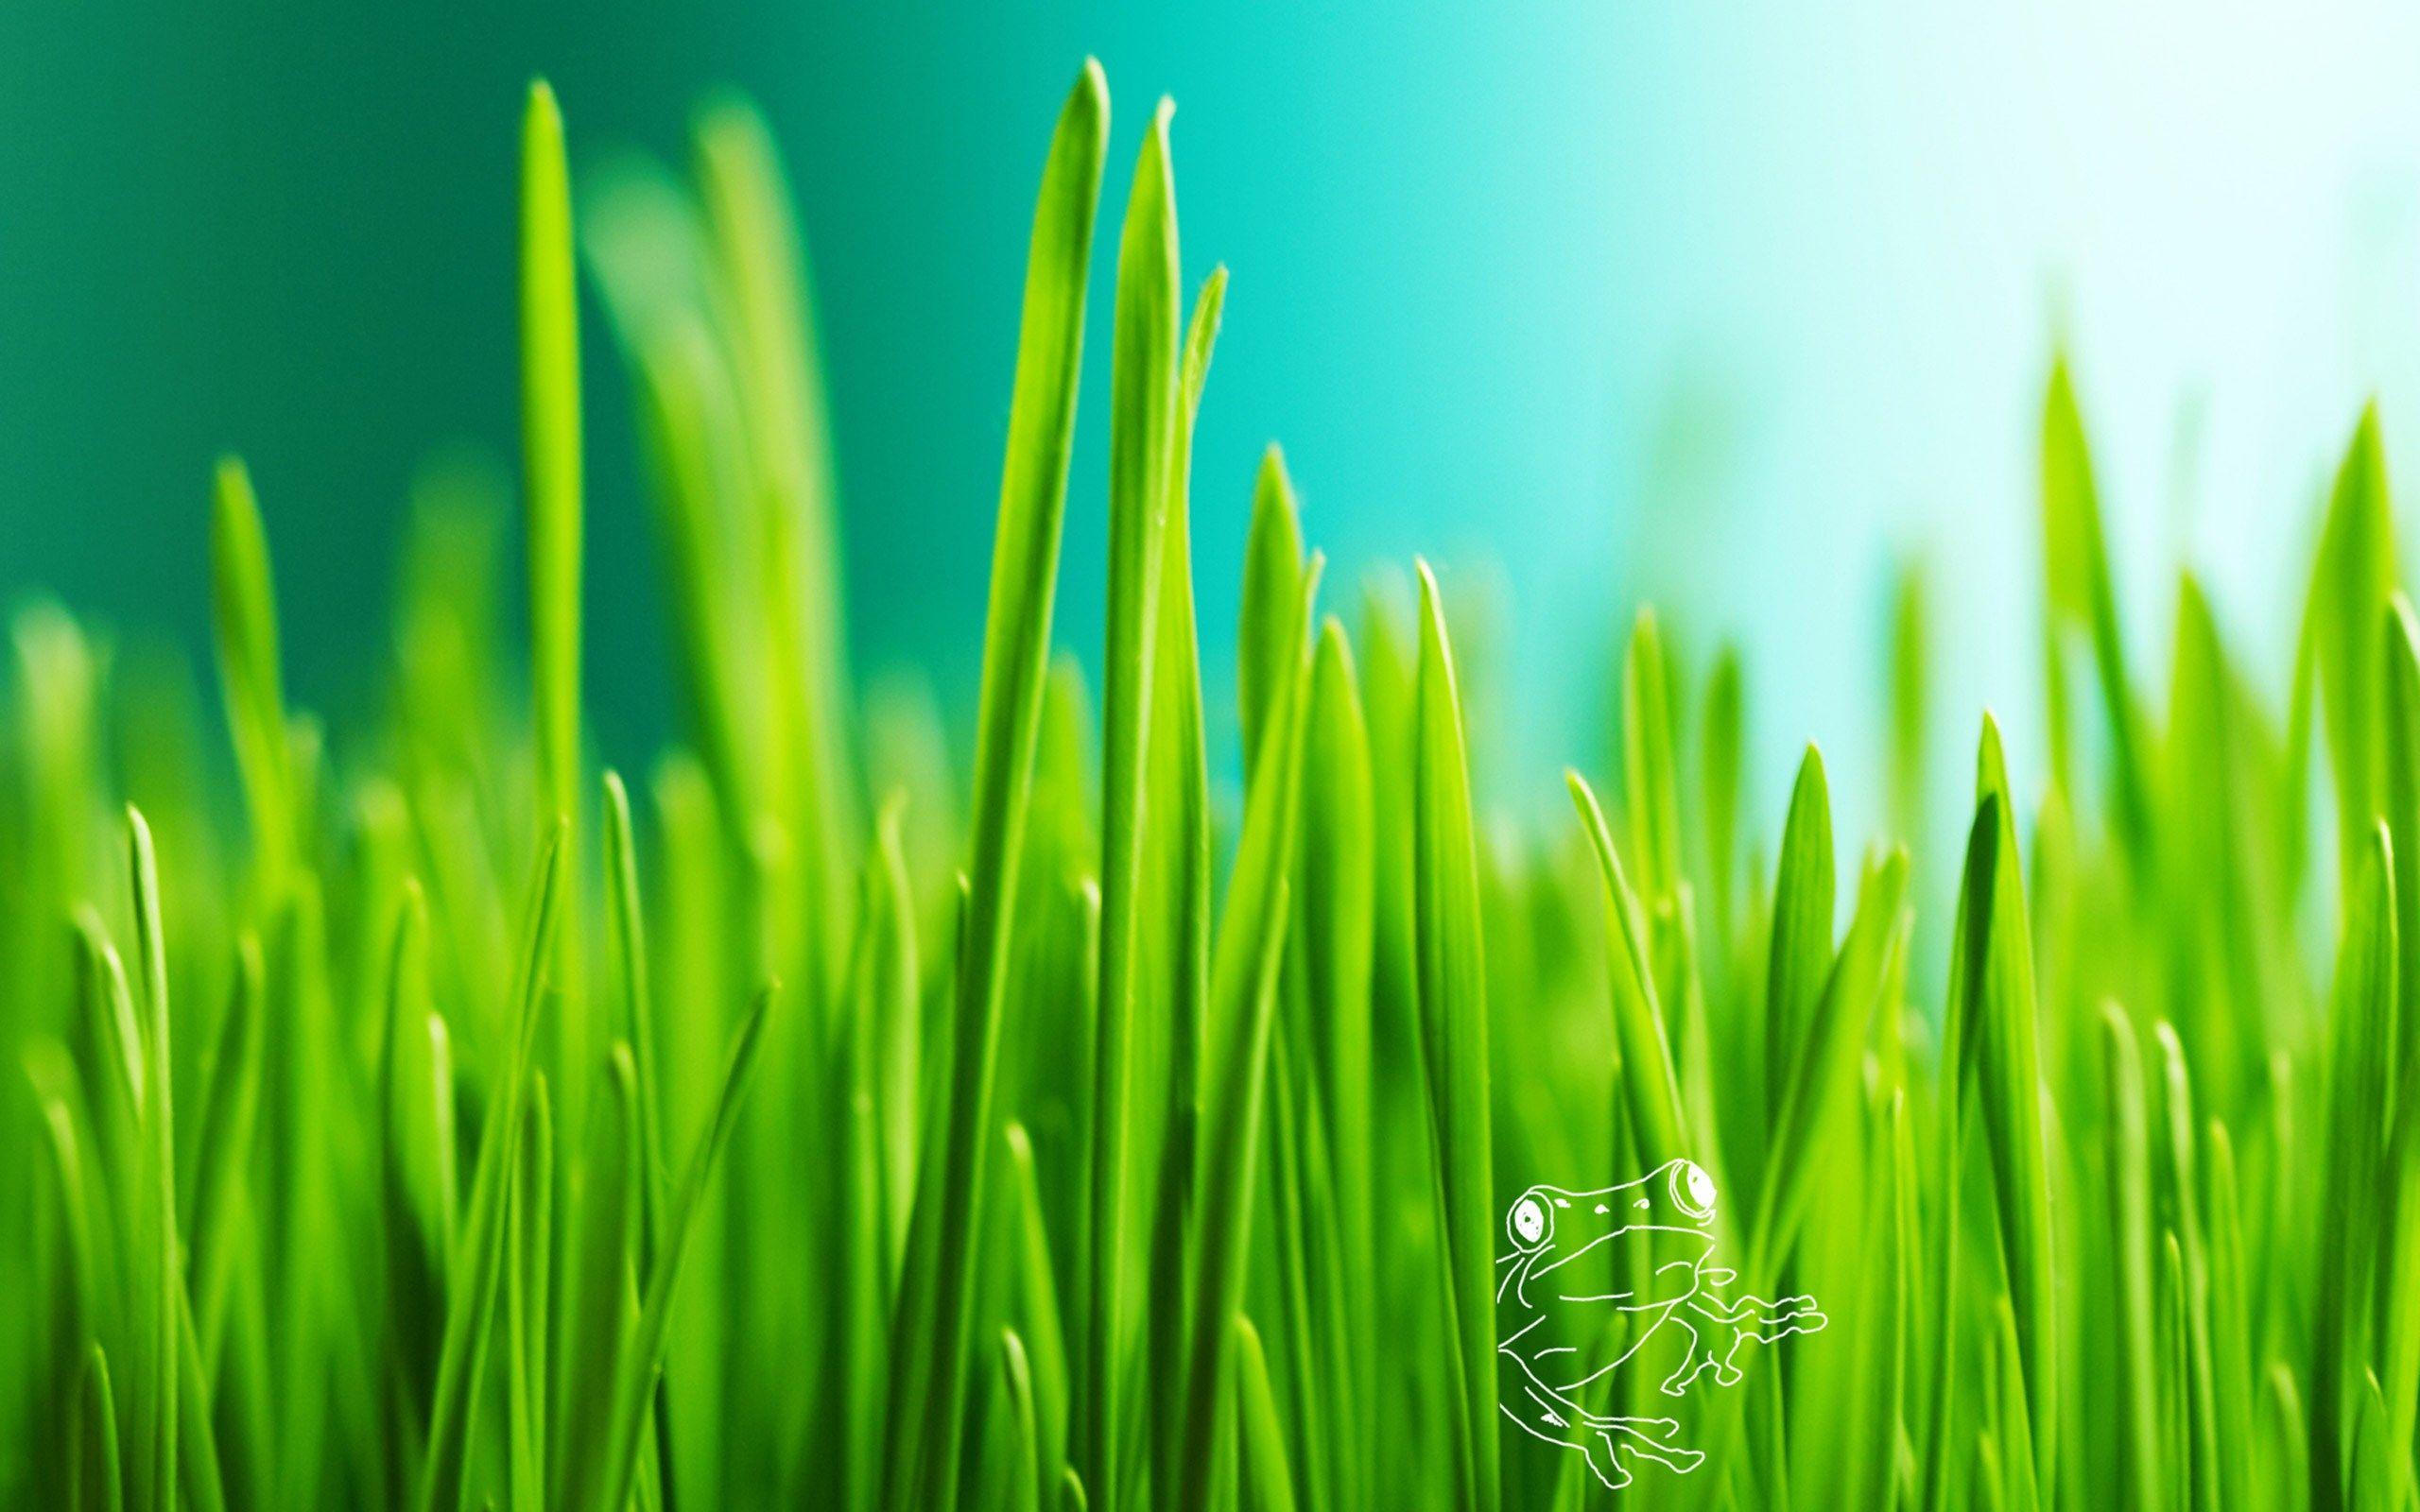 beautiful grass wallpaper download for pc Grass